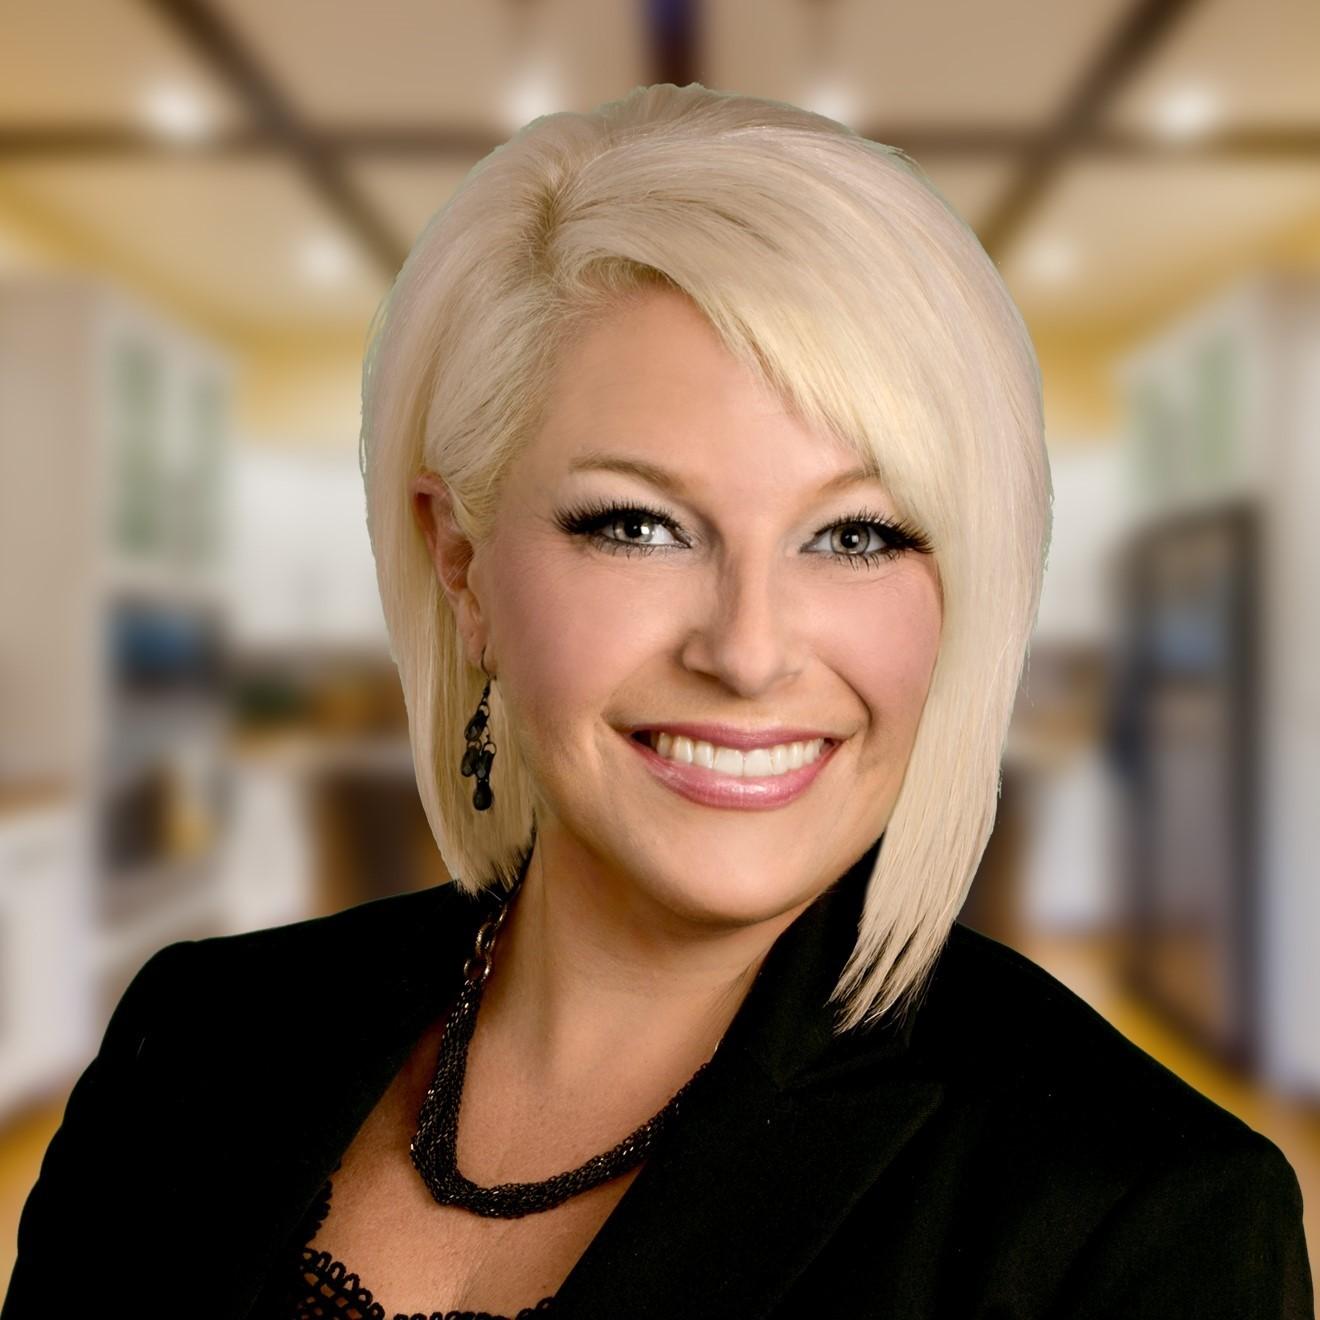 Angela Mae Schlagel